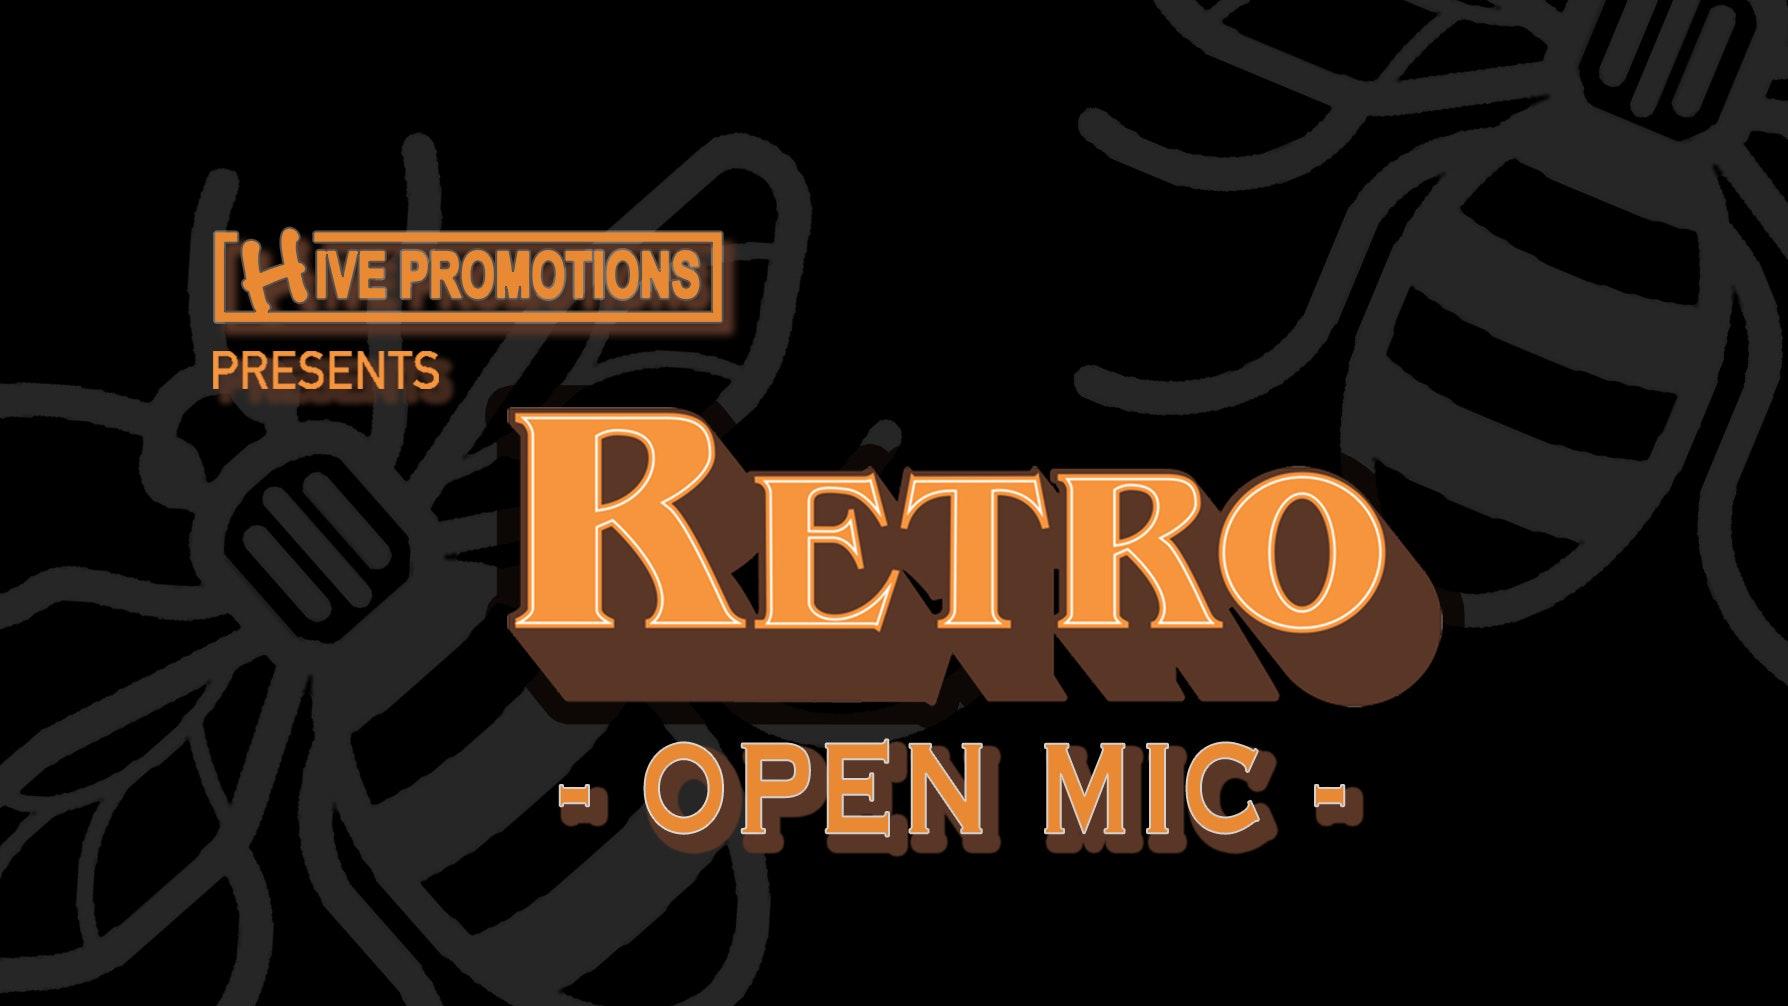 Retro Open Mic